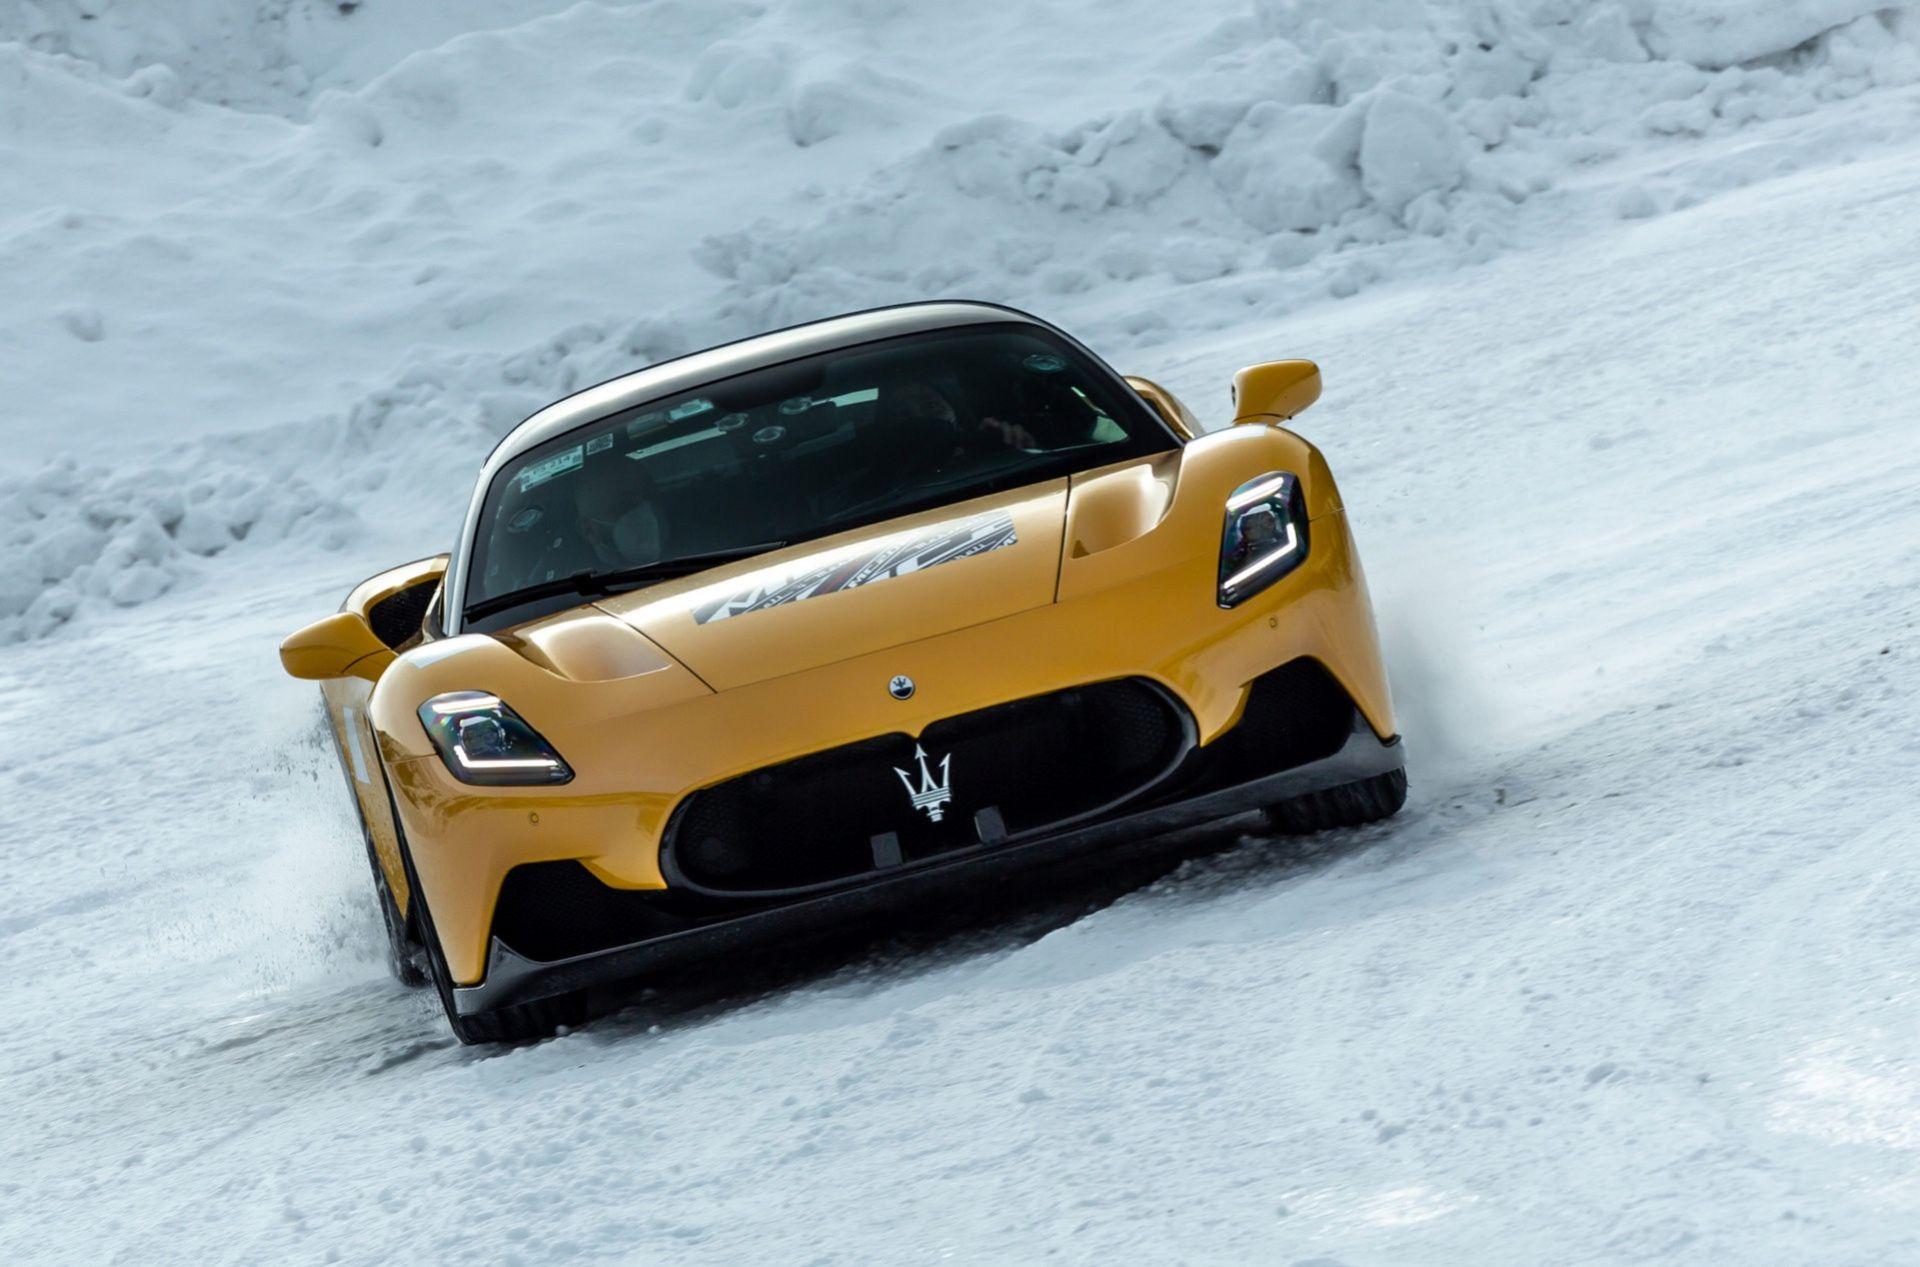 Maserati MC20 sladdar i snön